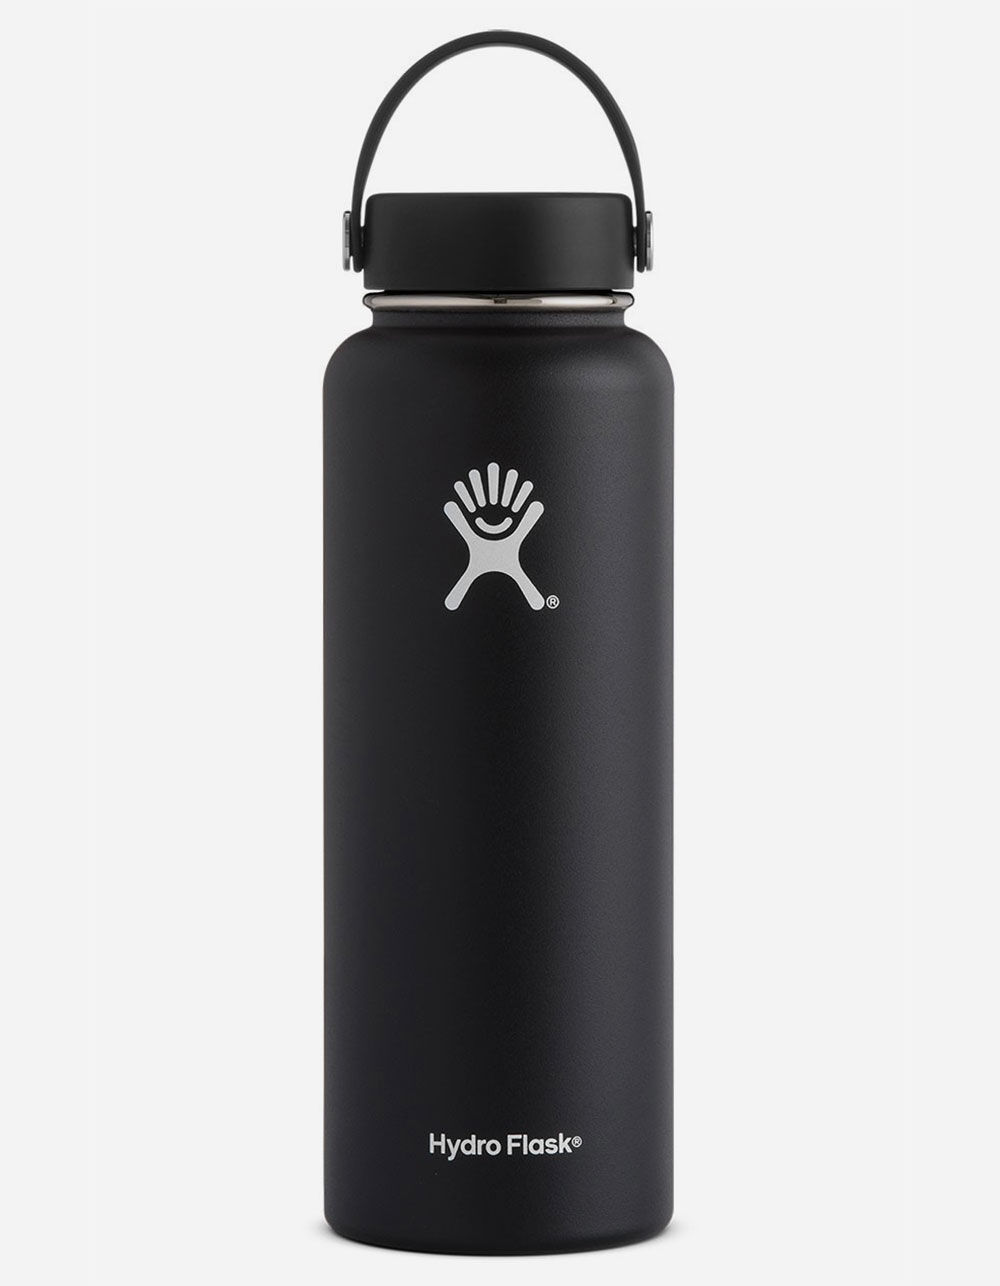 HYDRO FLASK Black 40oz Wide Mouth Water Bottle